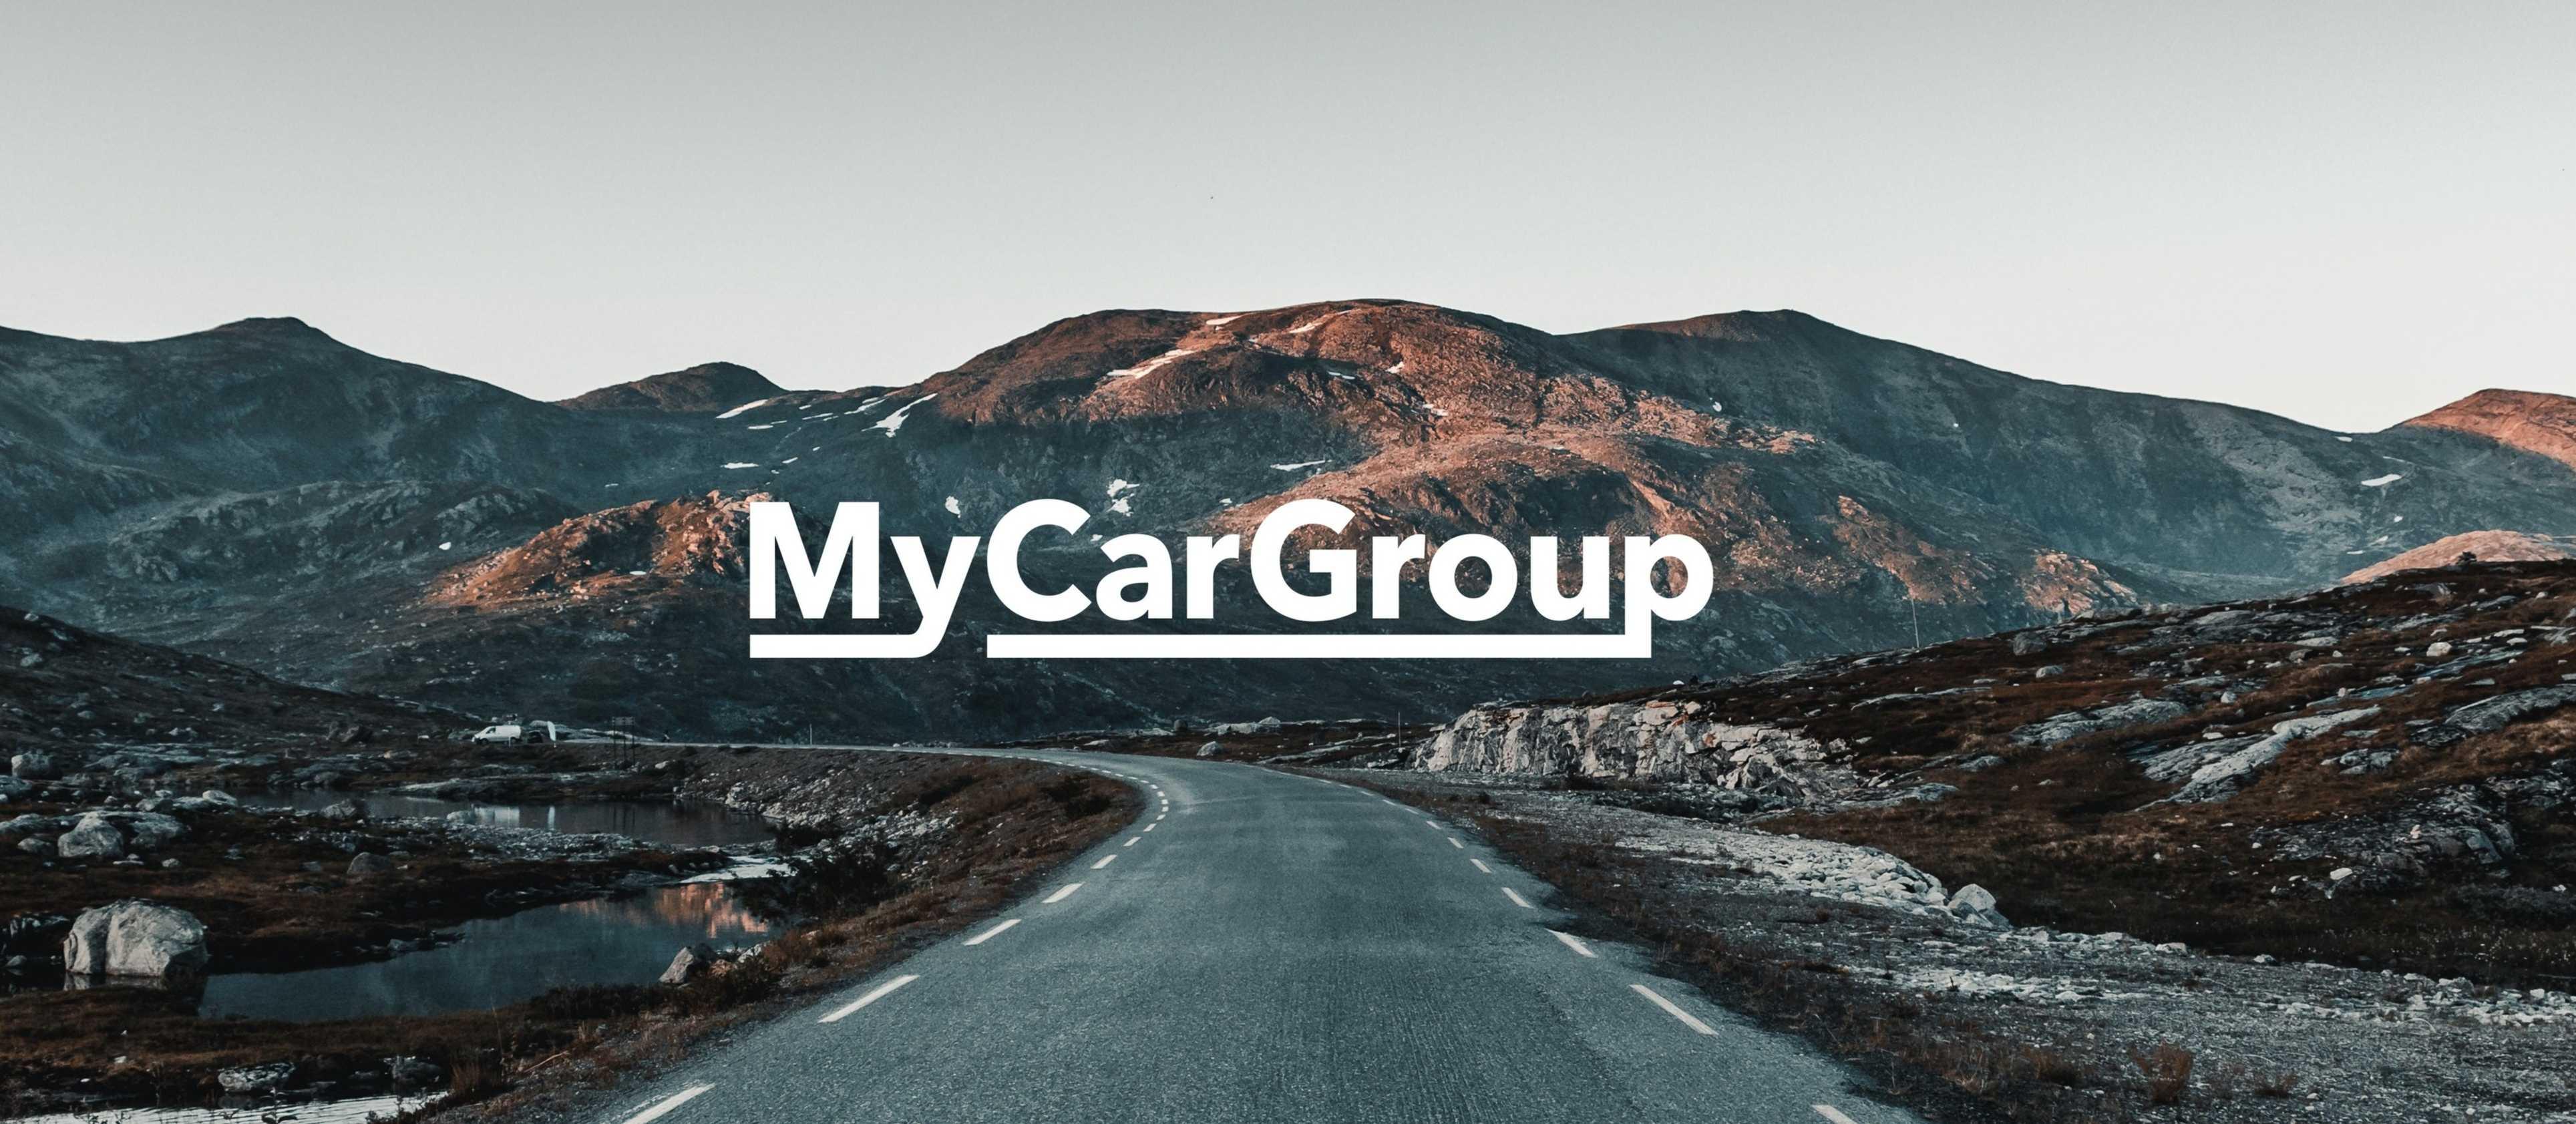 MyCar Group - Norways new automotive cluster